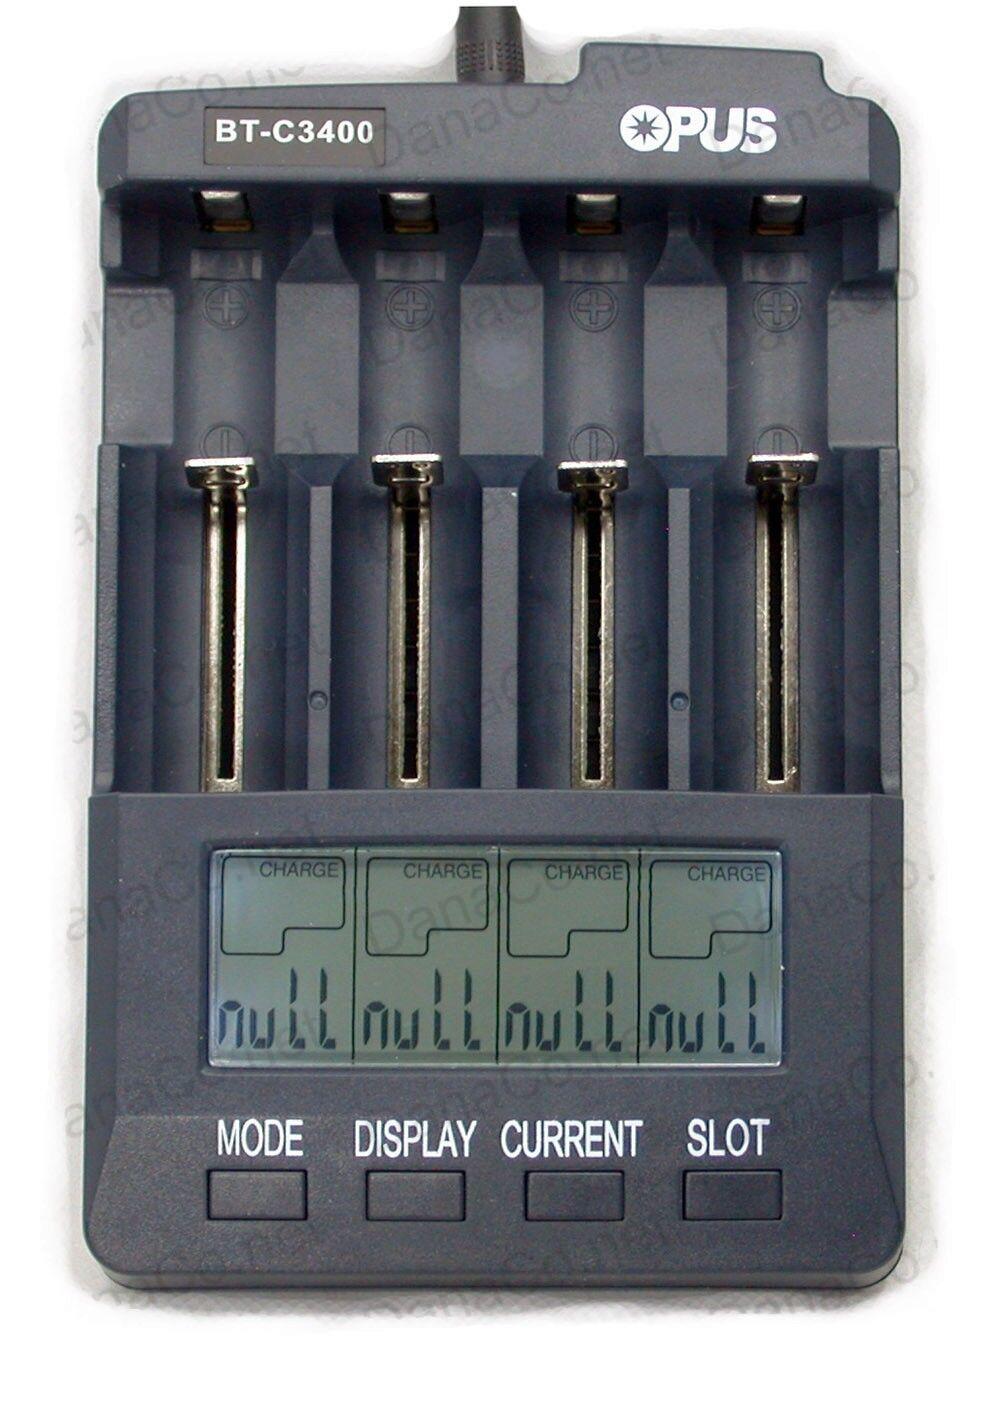 как выглядит Зарядное устройство BT-C3400 V3.1 Battery Charger Analyzer Tester Li-ion AA AAA NiMH 18650 BT-C3100 фото